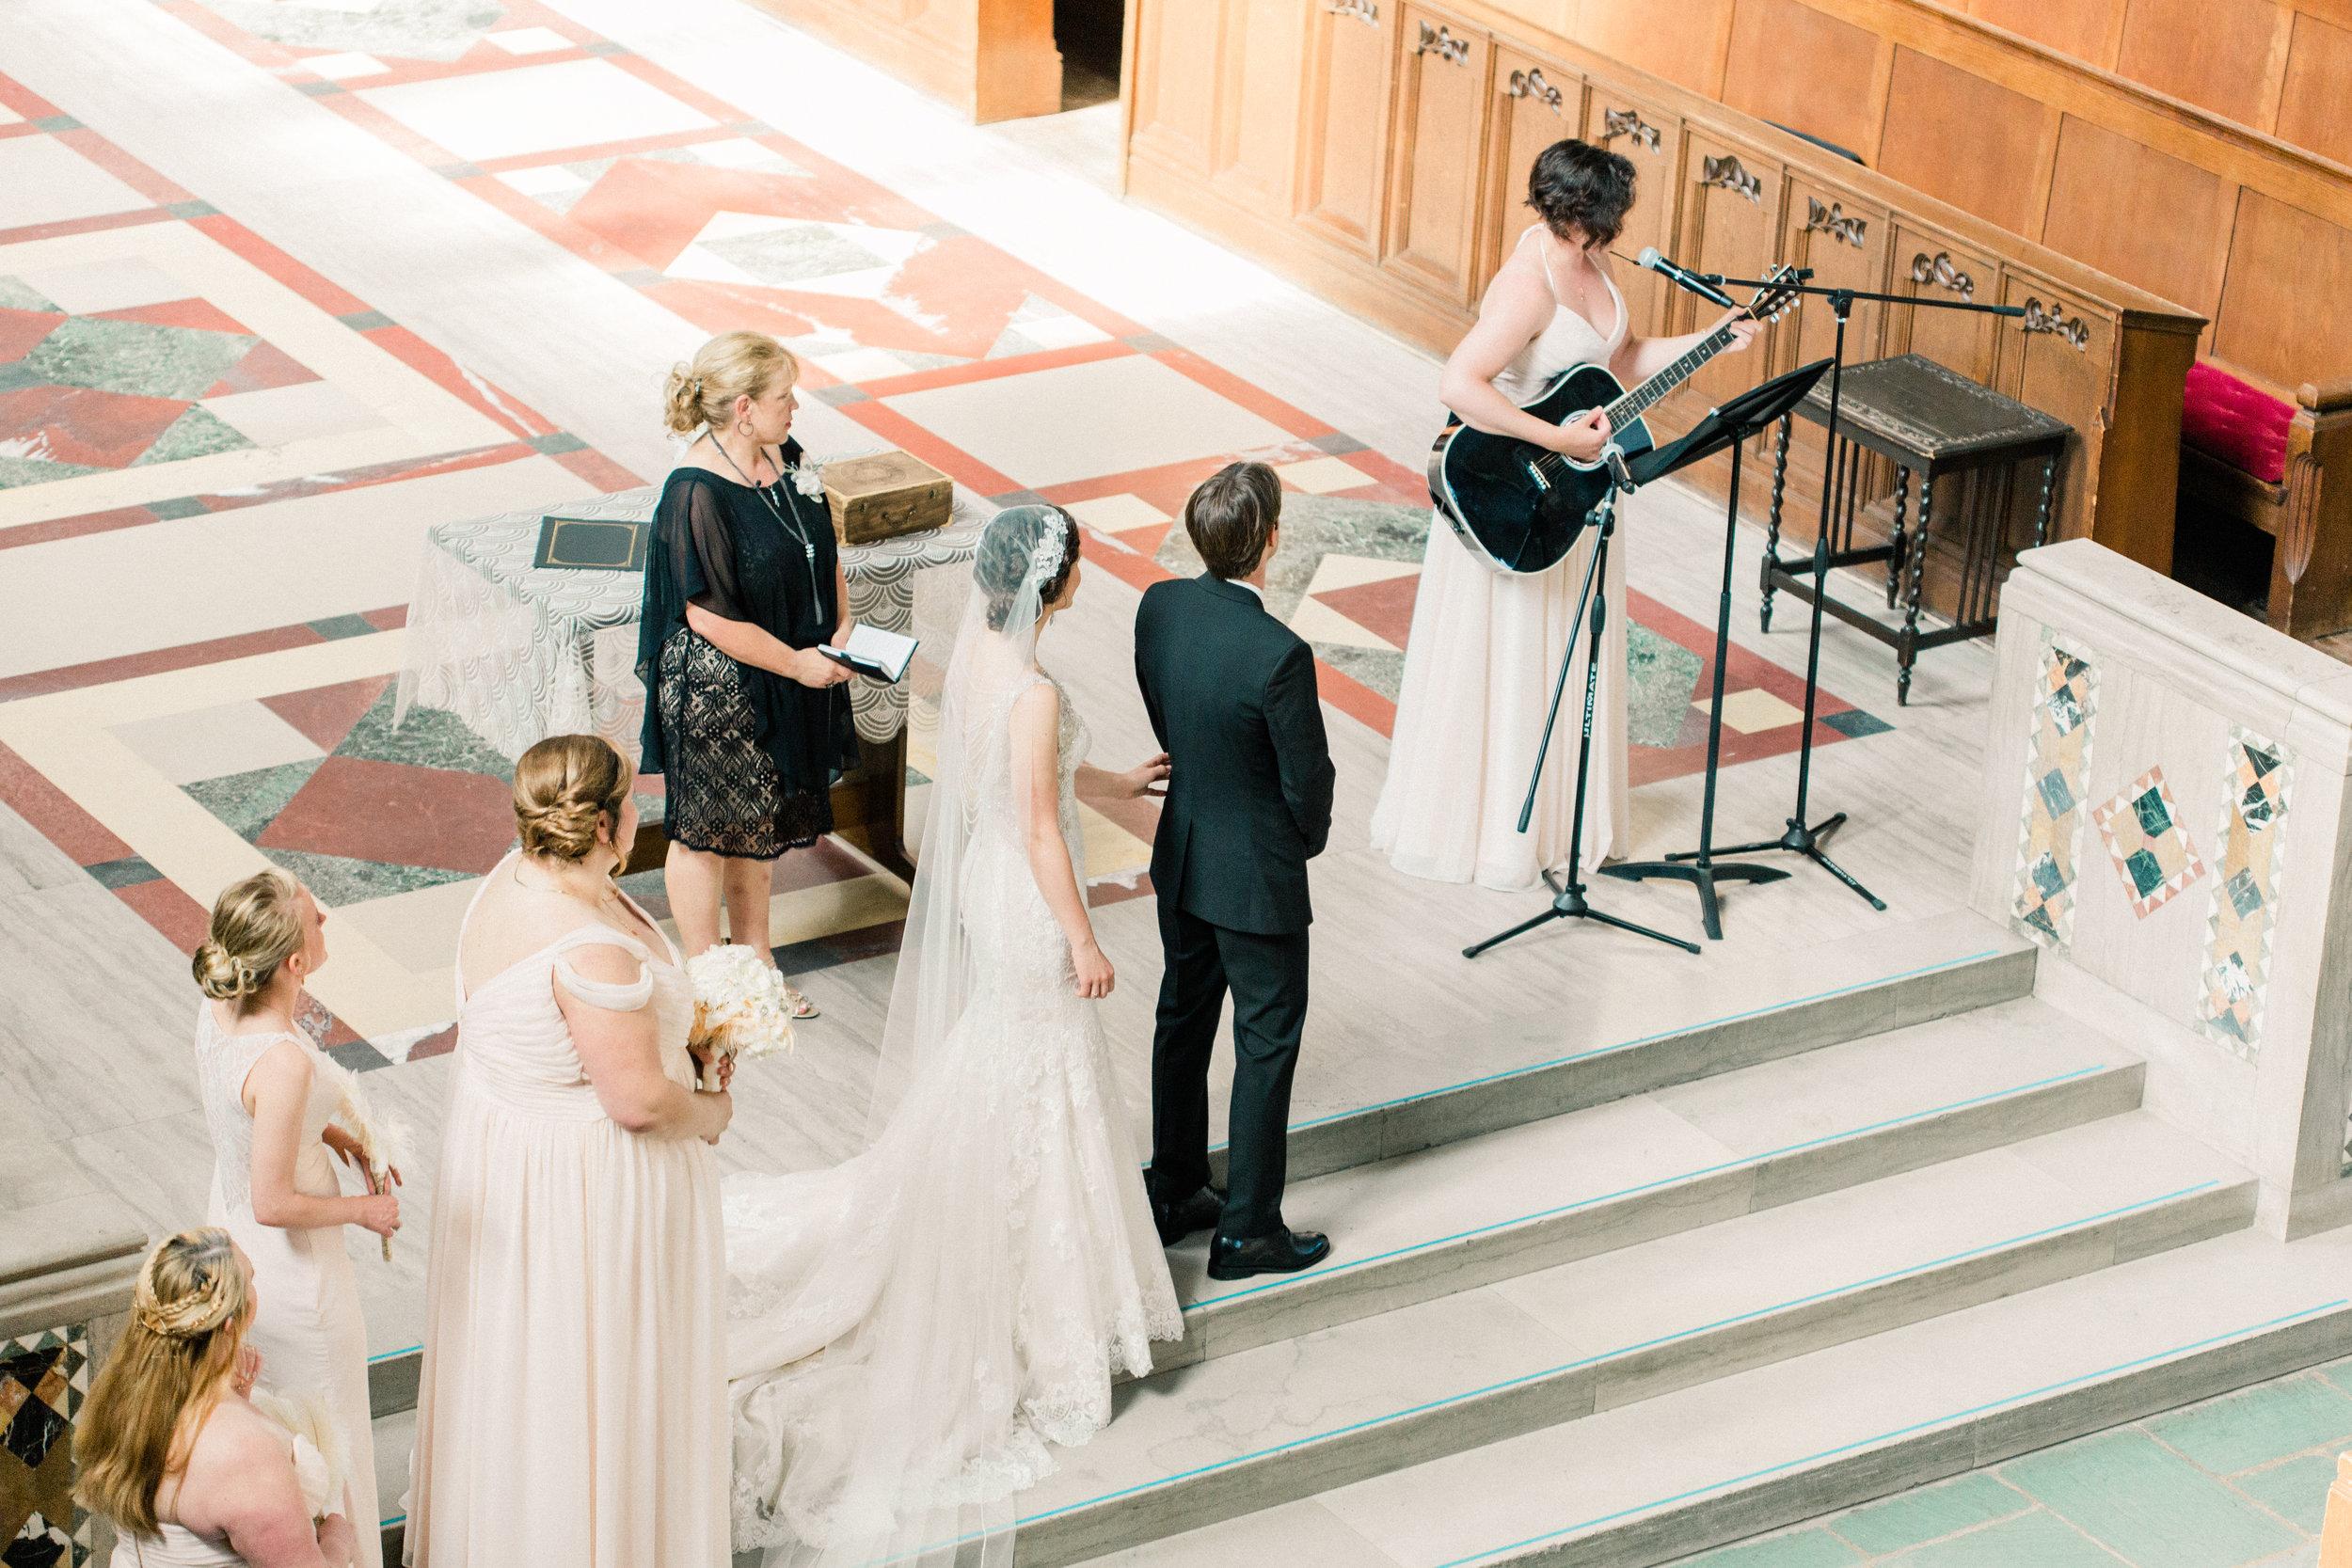 Dorothy_Louise_Photography_University_of_Chicago_Chapel_Wedding-24.jpg